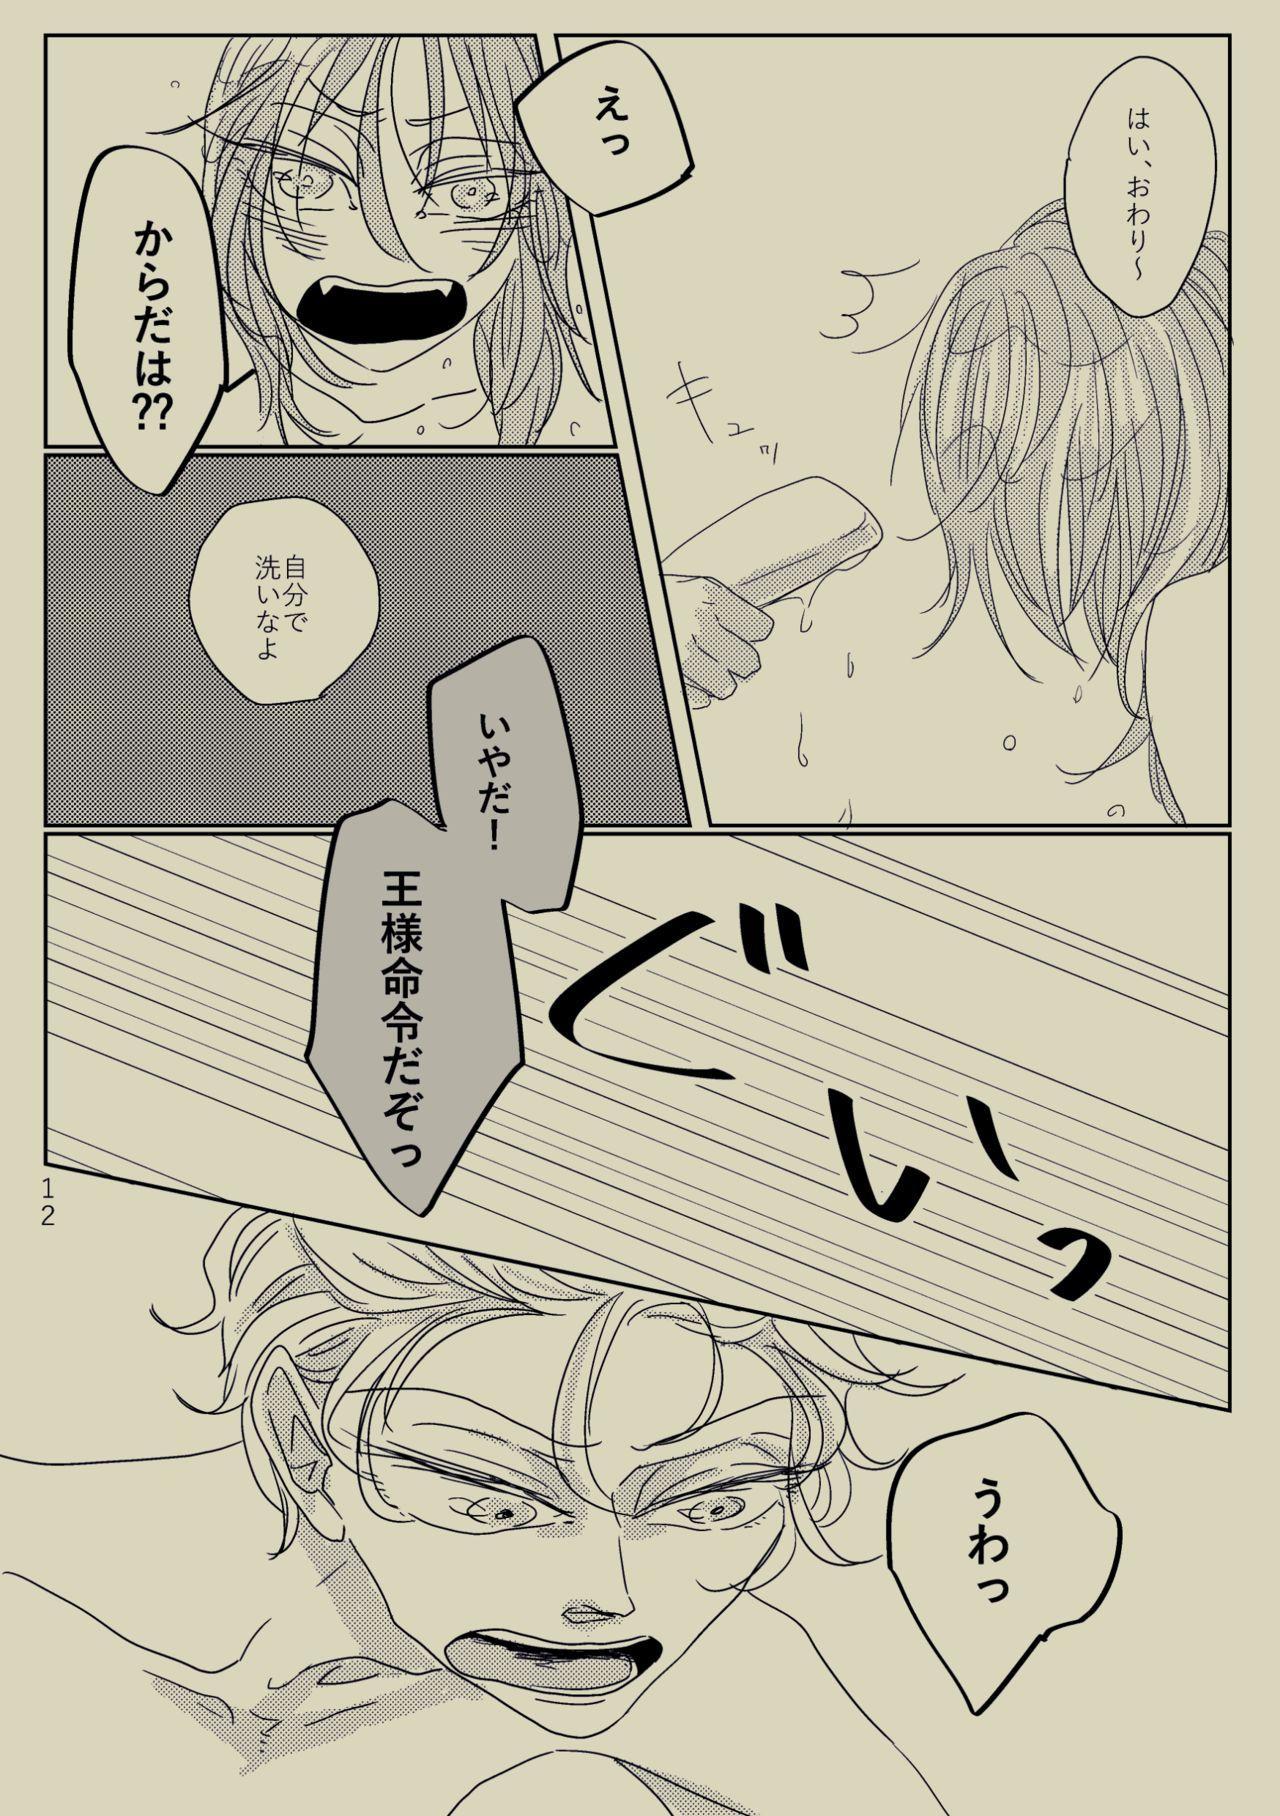 Kimi to Ireba Inspiration☆ 10